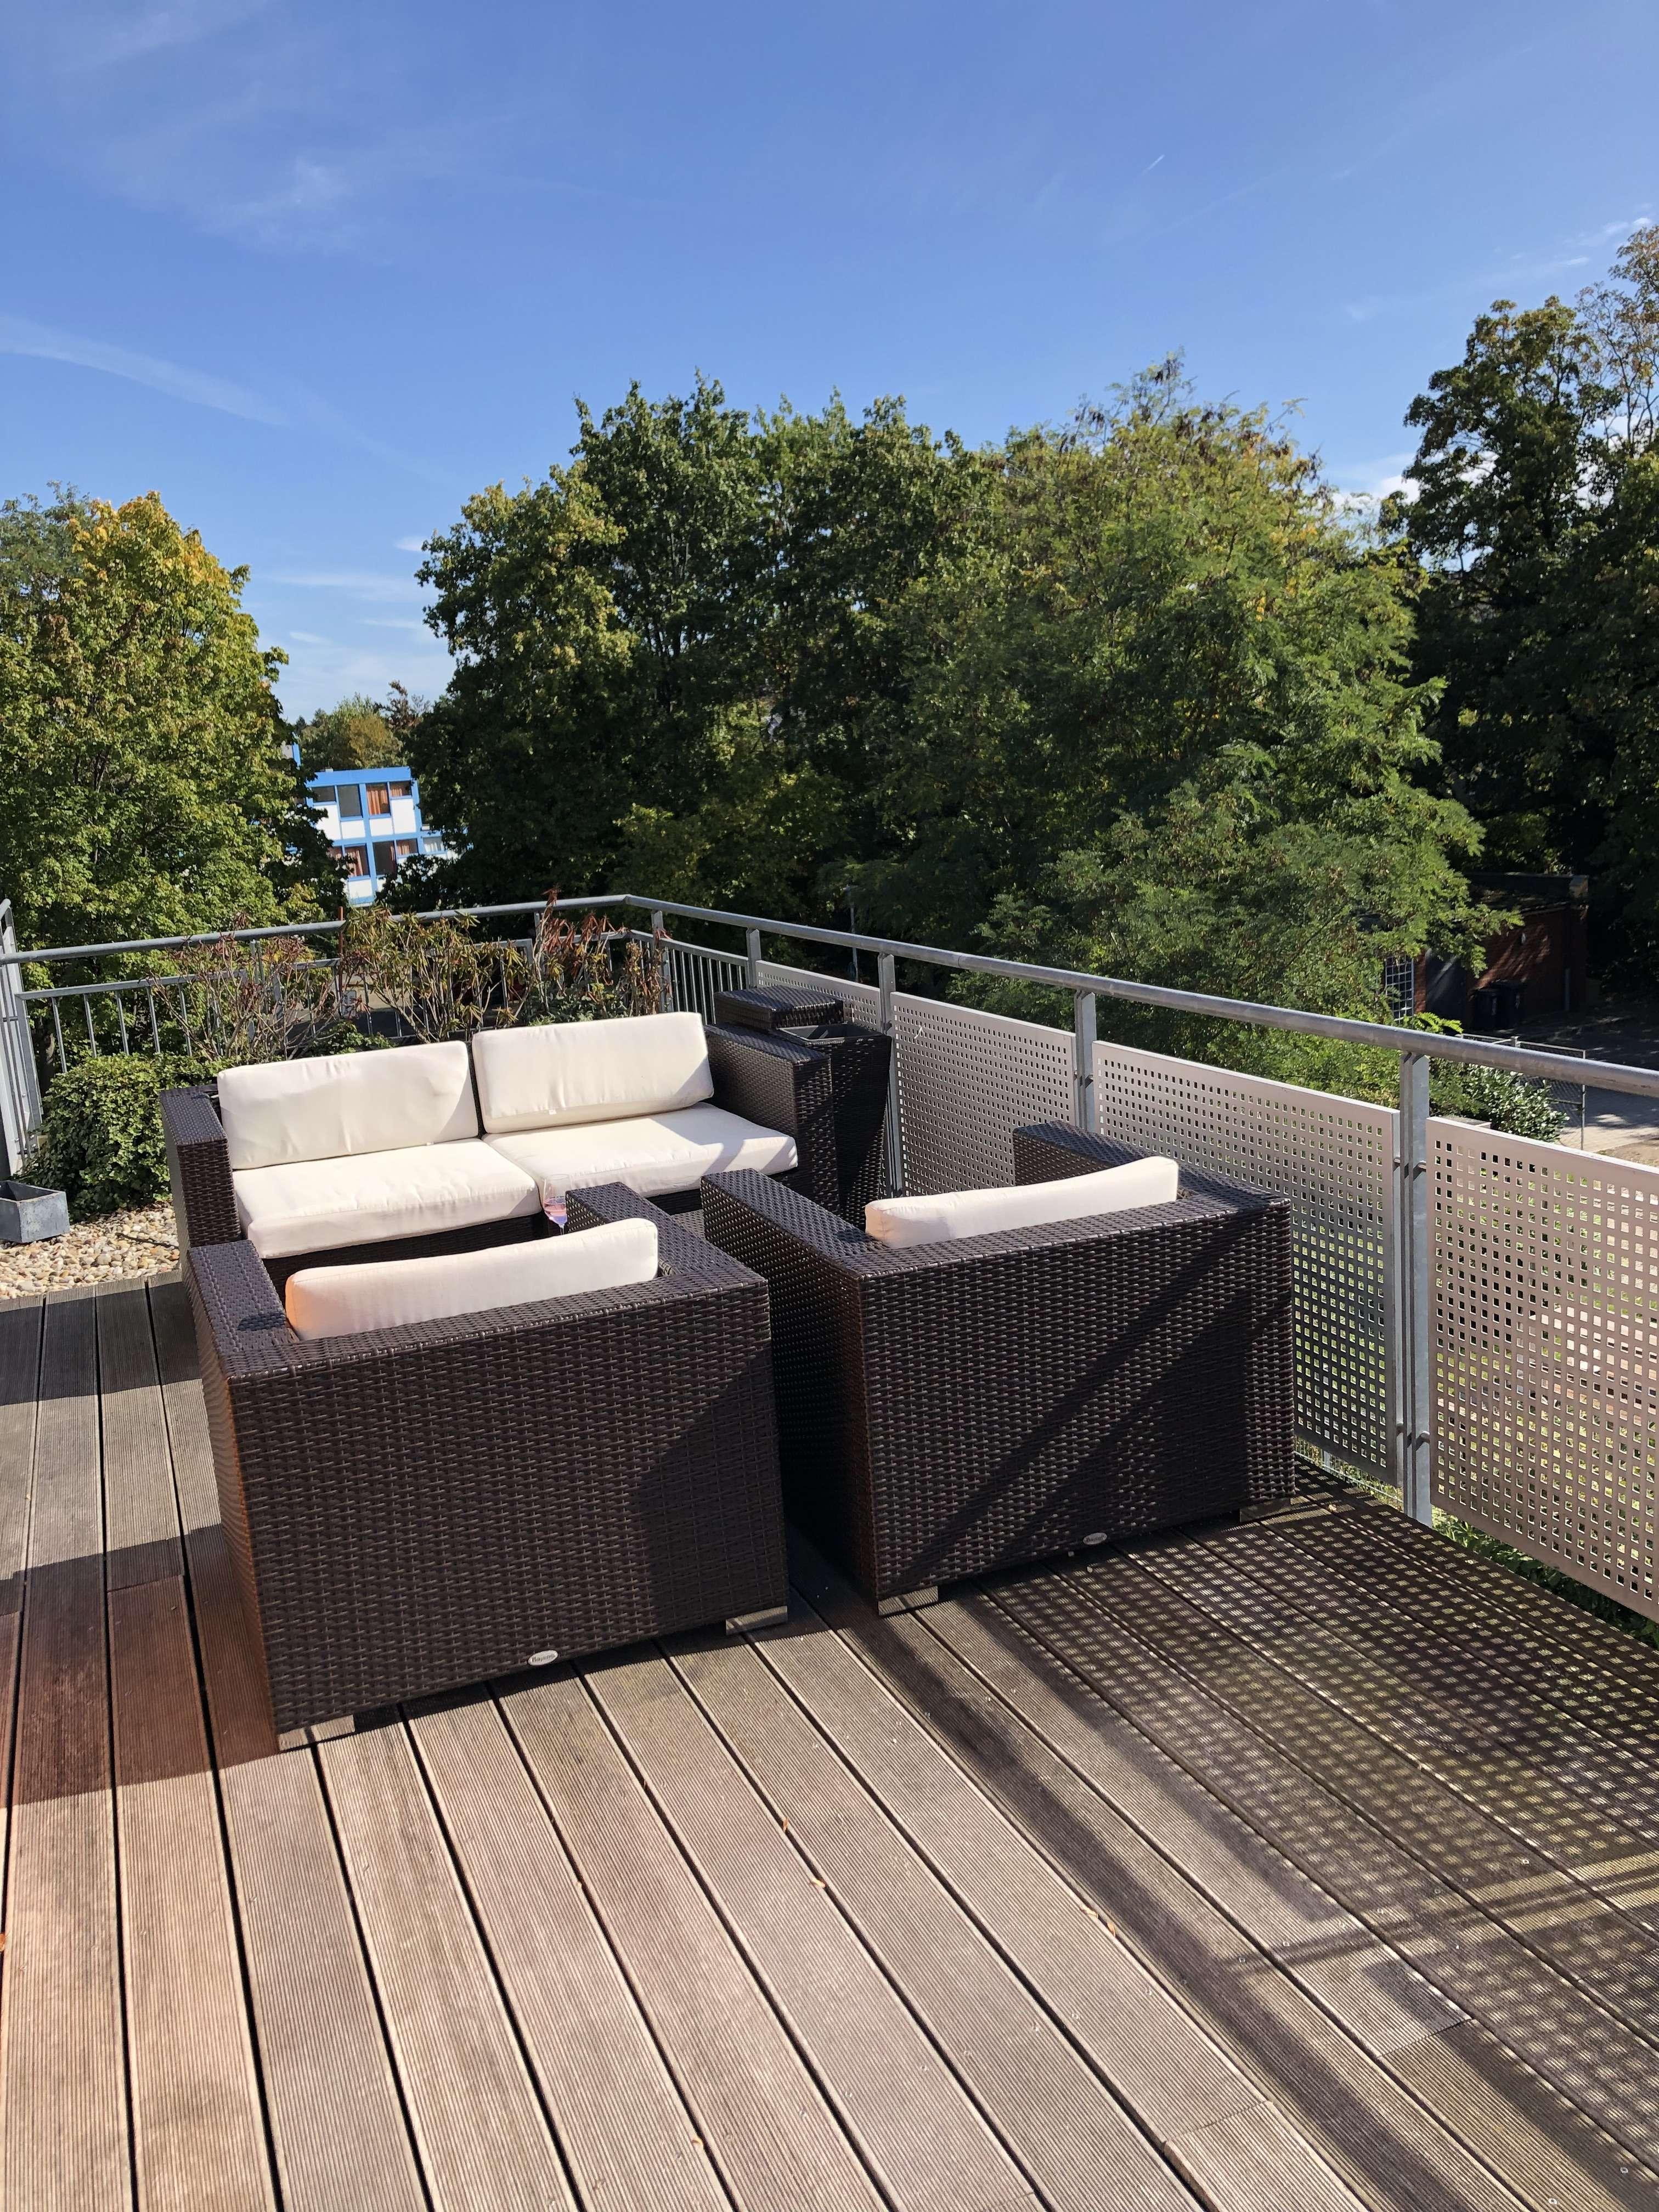 exklusives Penthouse in der Nordstadt möbliert in Maxfeld (Nürnberg)